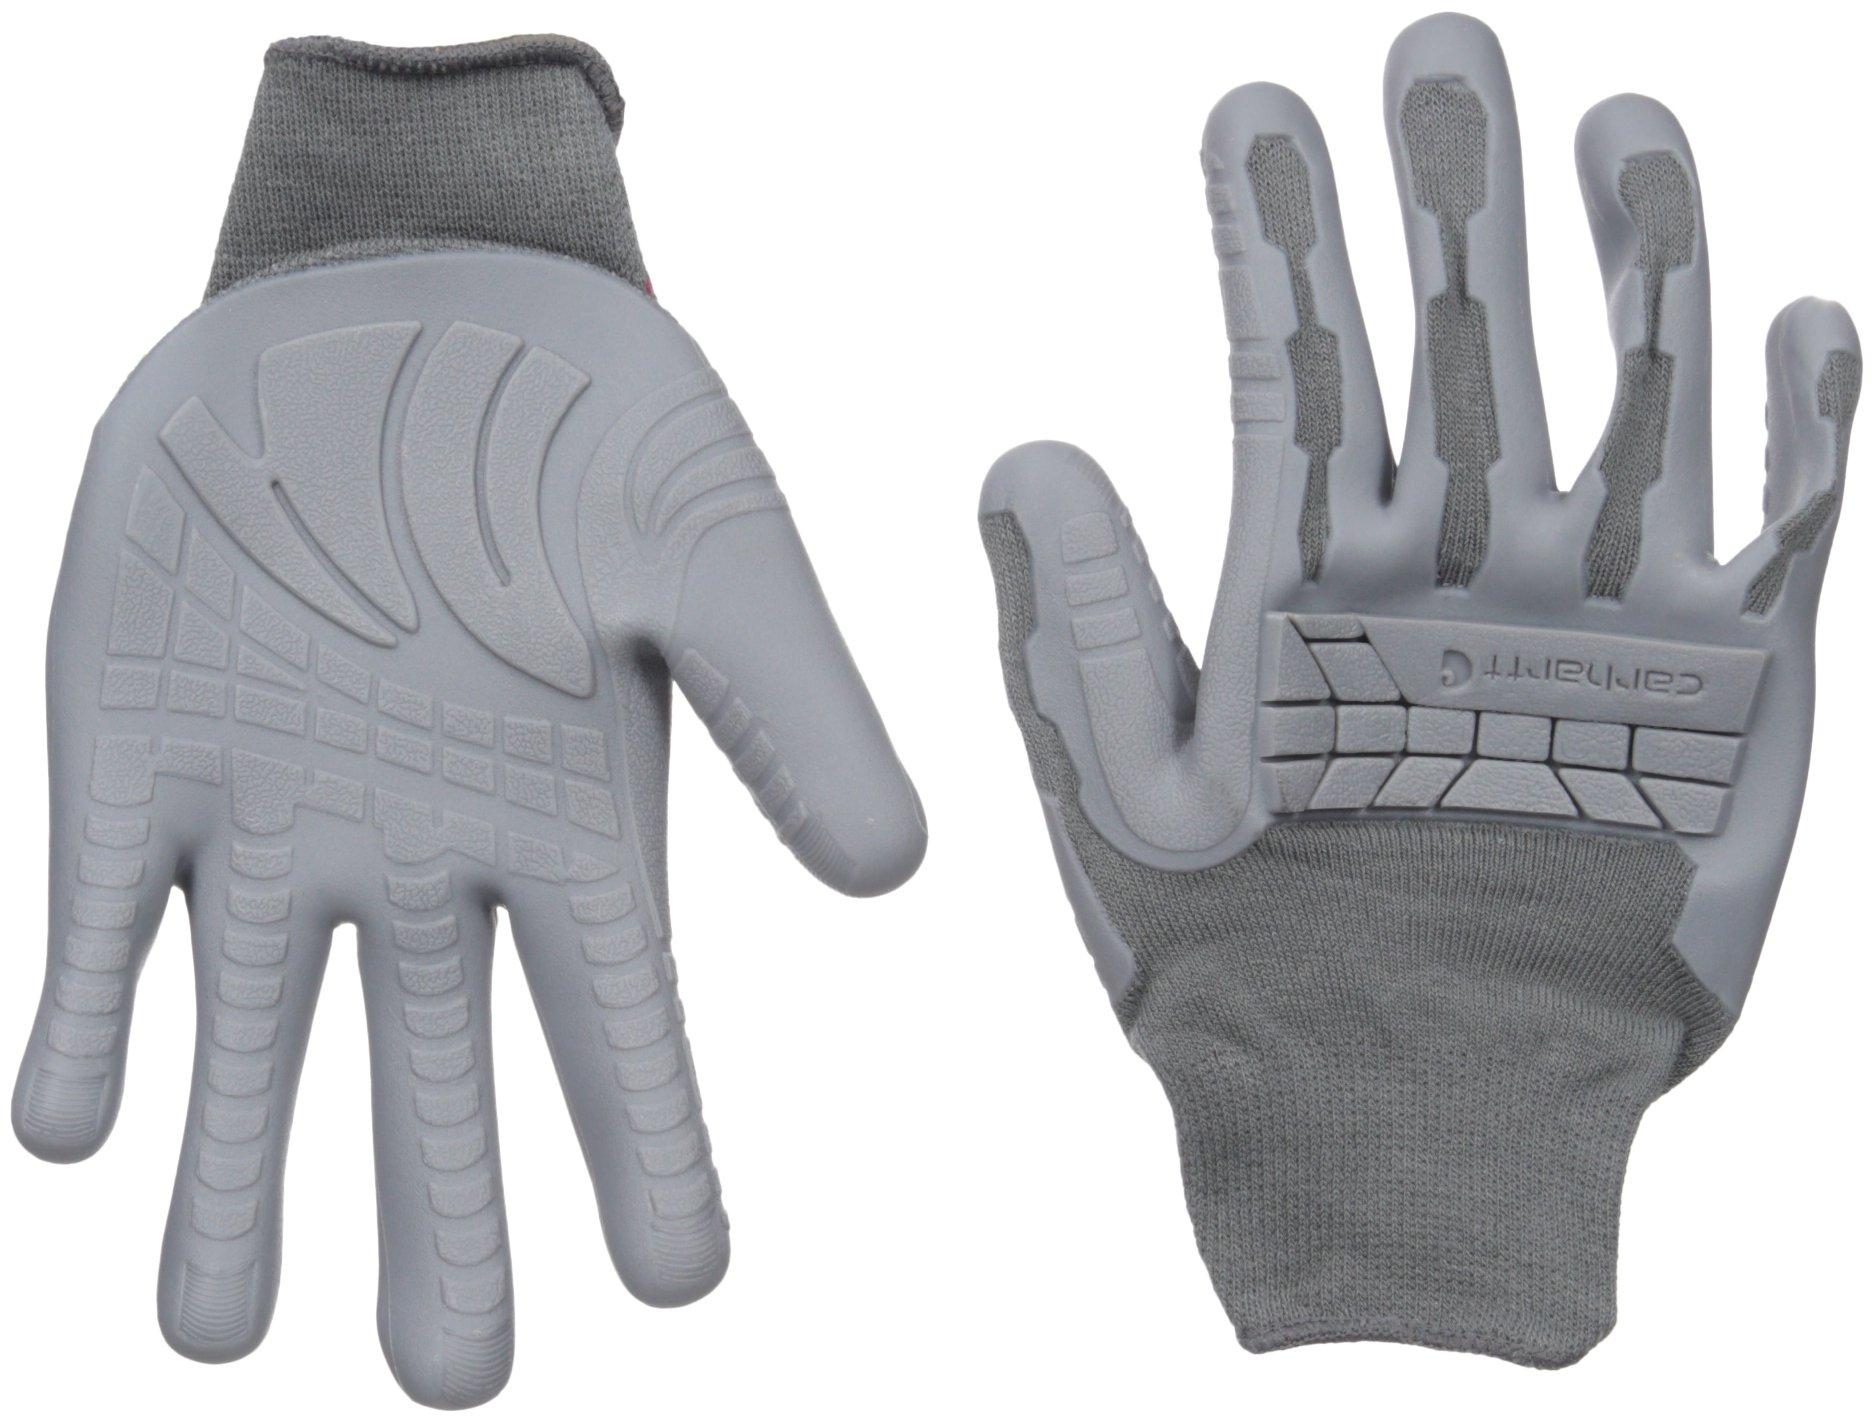 Carhartt Women's Knuckler Glove, Grey, Large/X-Large